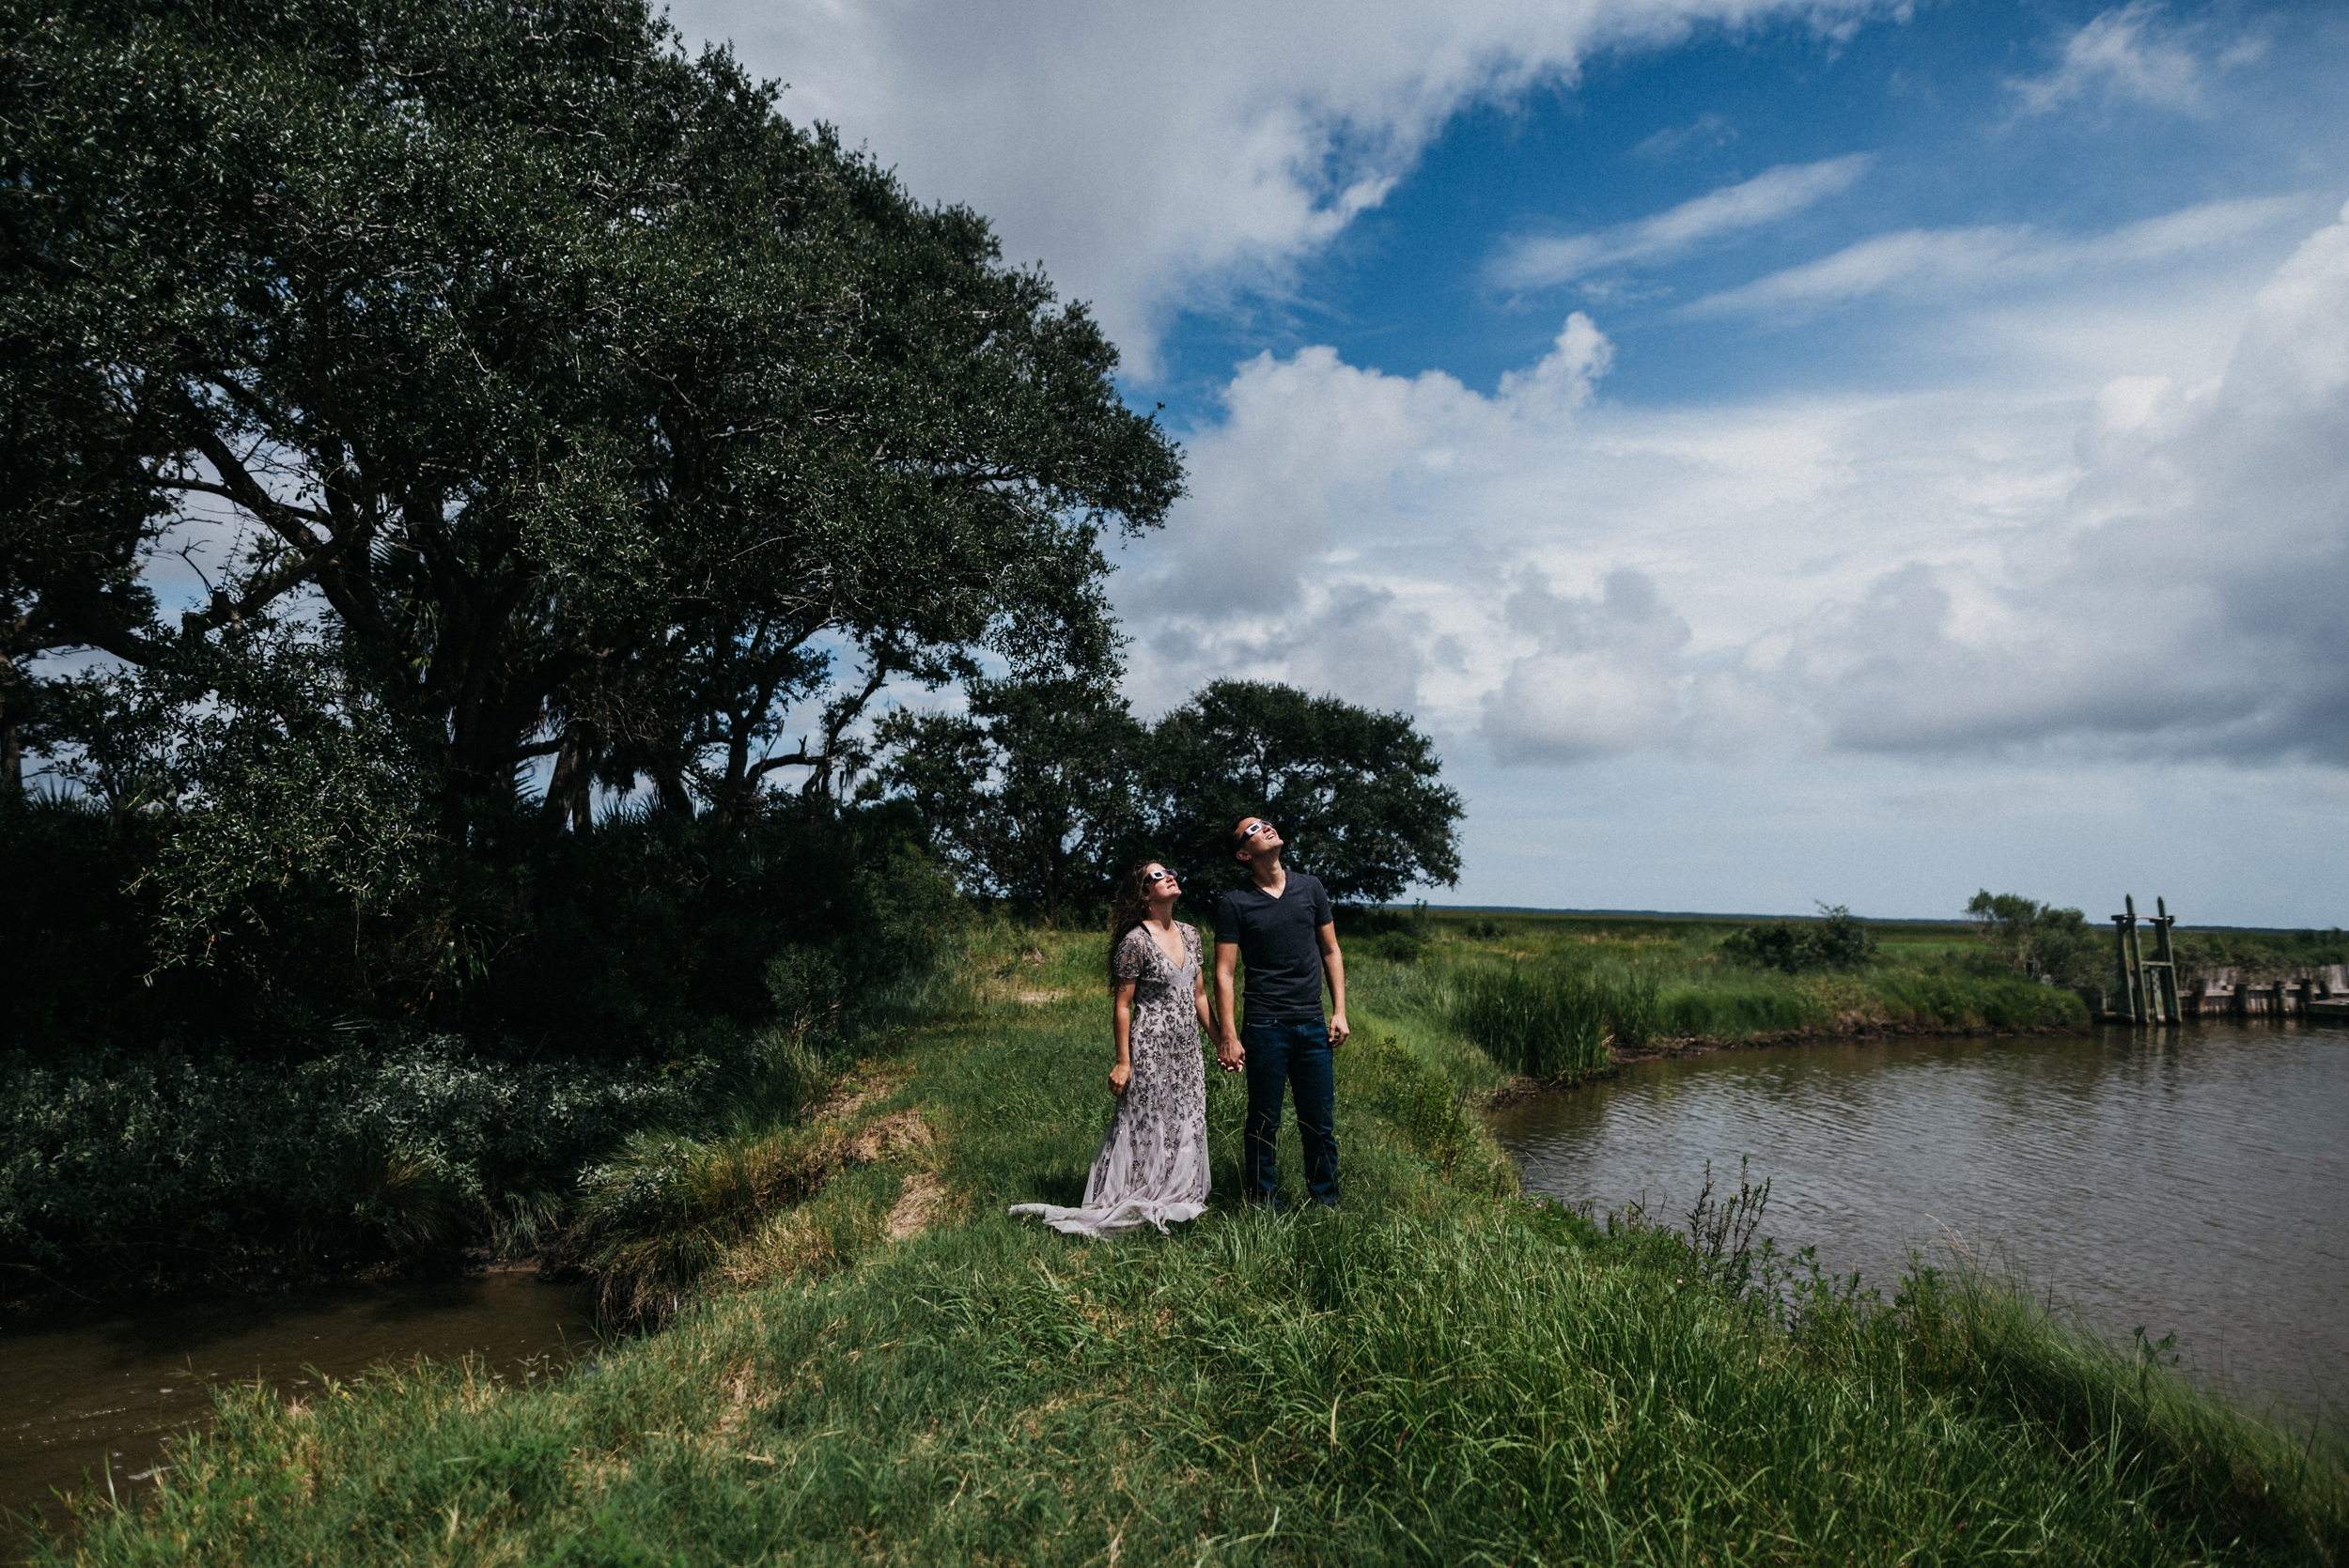 desiree-gardner-photography-pairs-france-monet-garden-monets-couple-wedding-engagement-giverny-30-a-30a-florida_0047.jpg